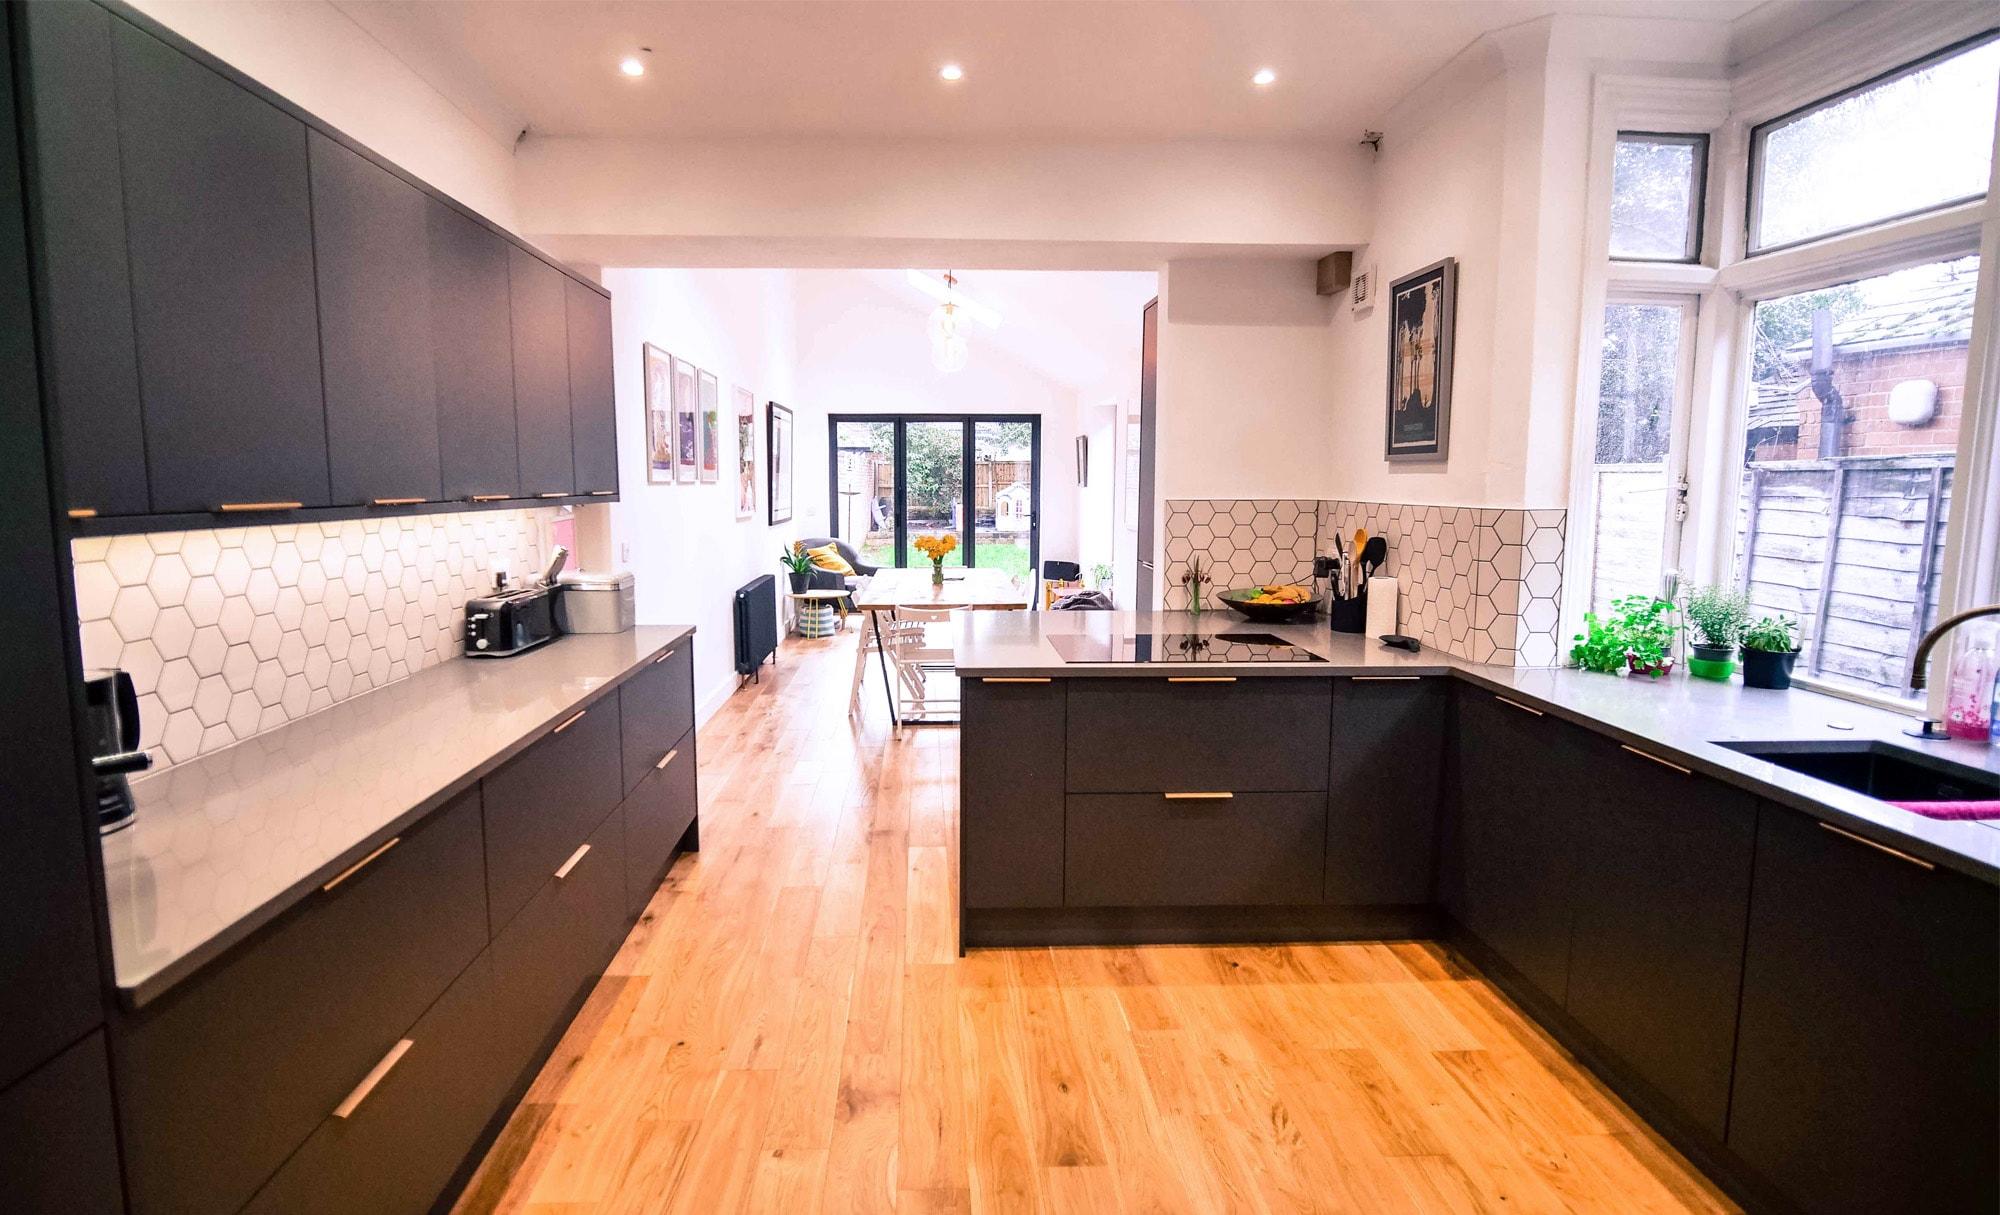 The Gallery Zola Matte Graphite Kitchen for Mr & Mrs Simcox of Stourbridge